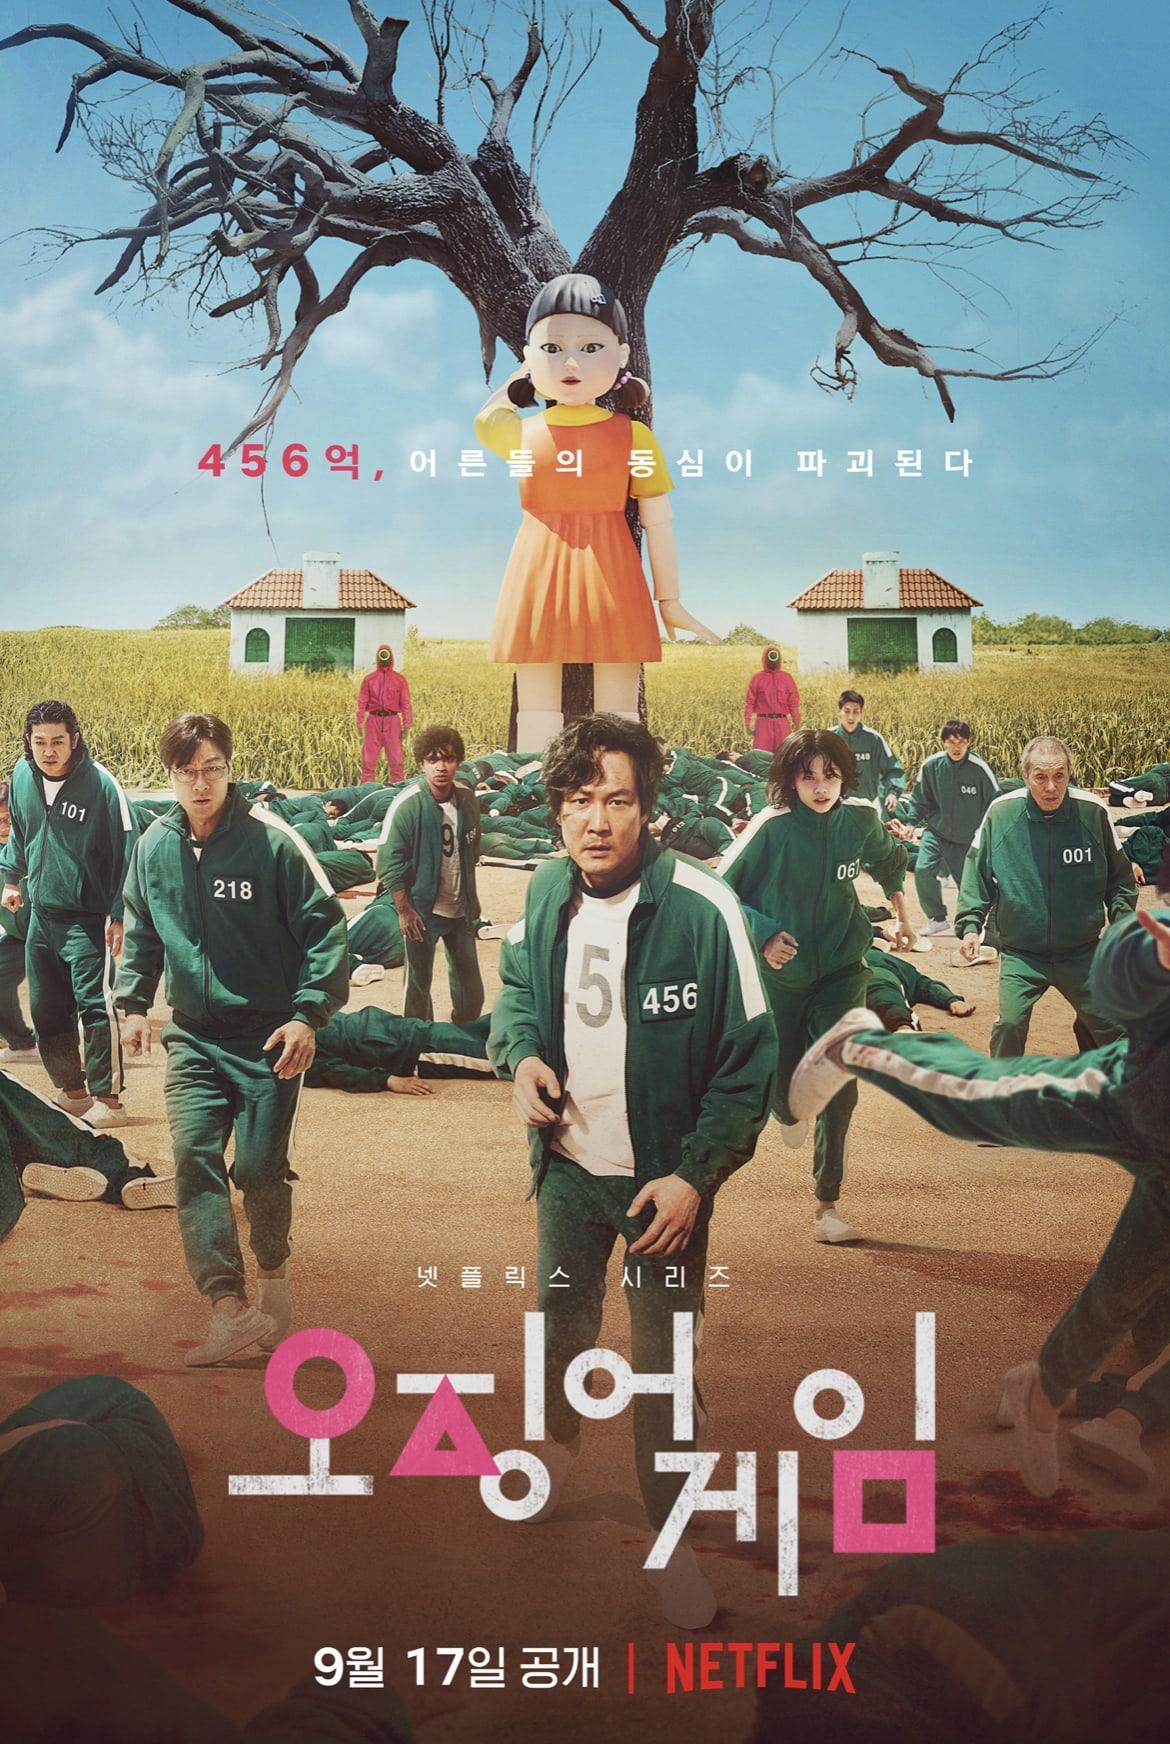 Poster drama Korea Squid Game.